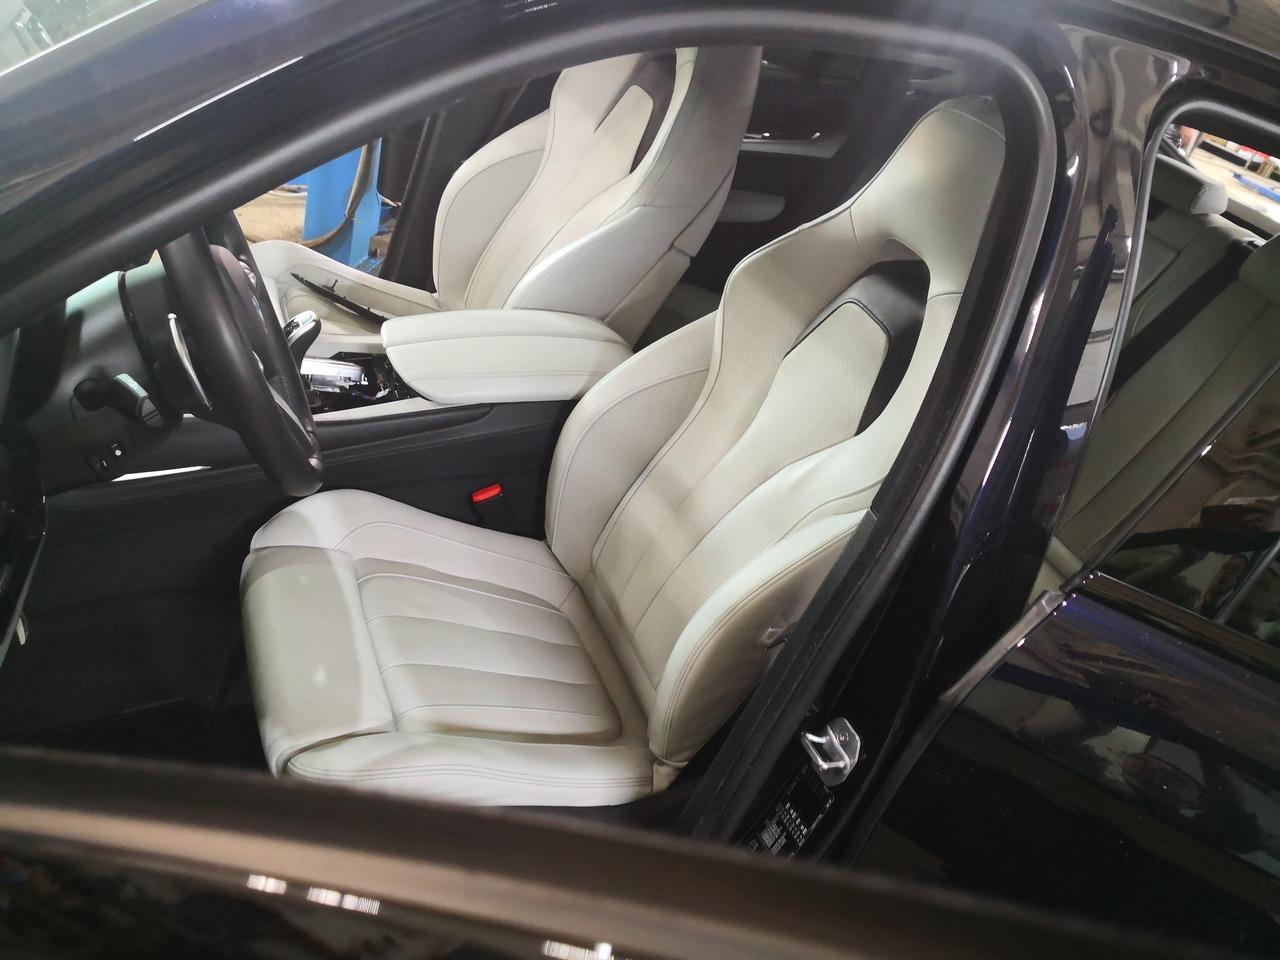 BMW X6 F16, тюнинг салона, спортивный салон X6M